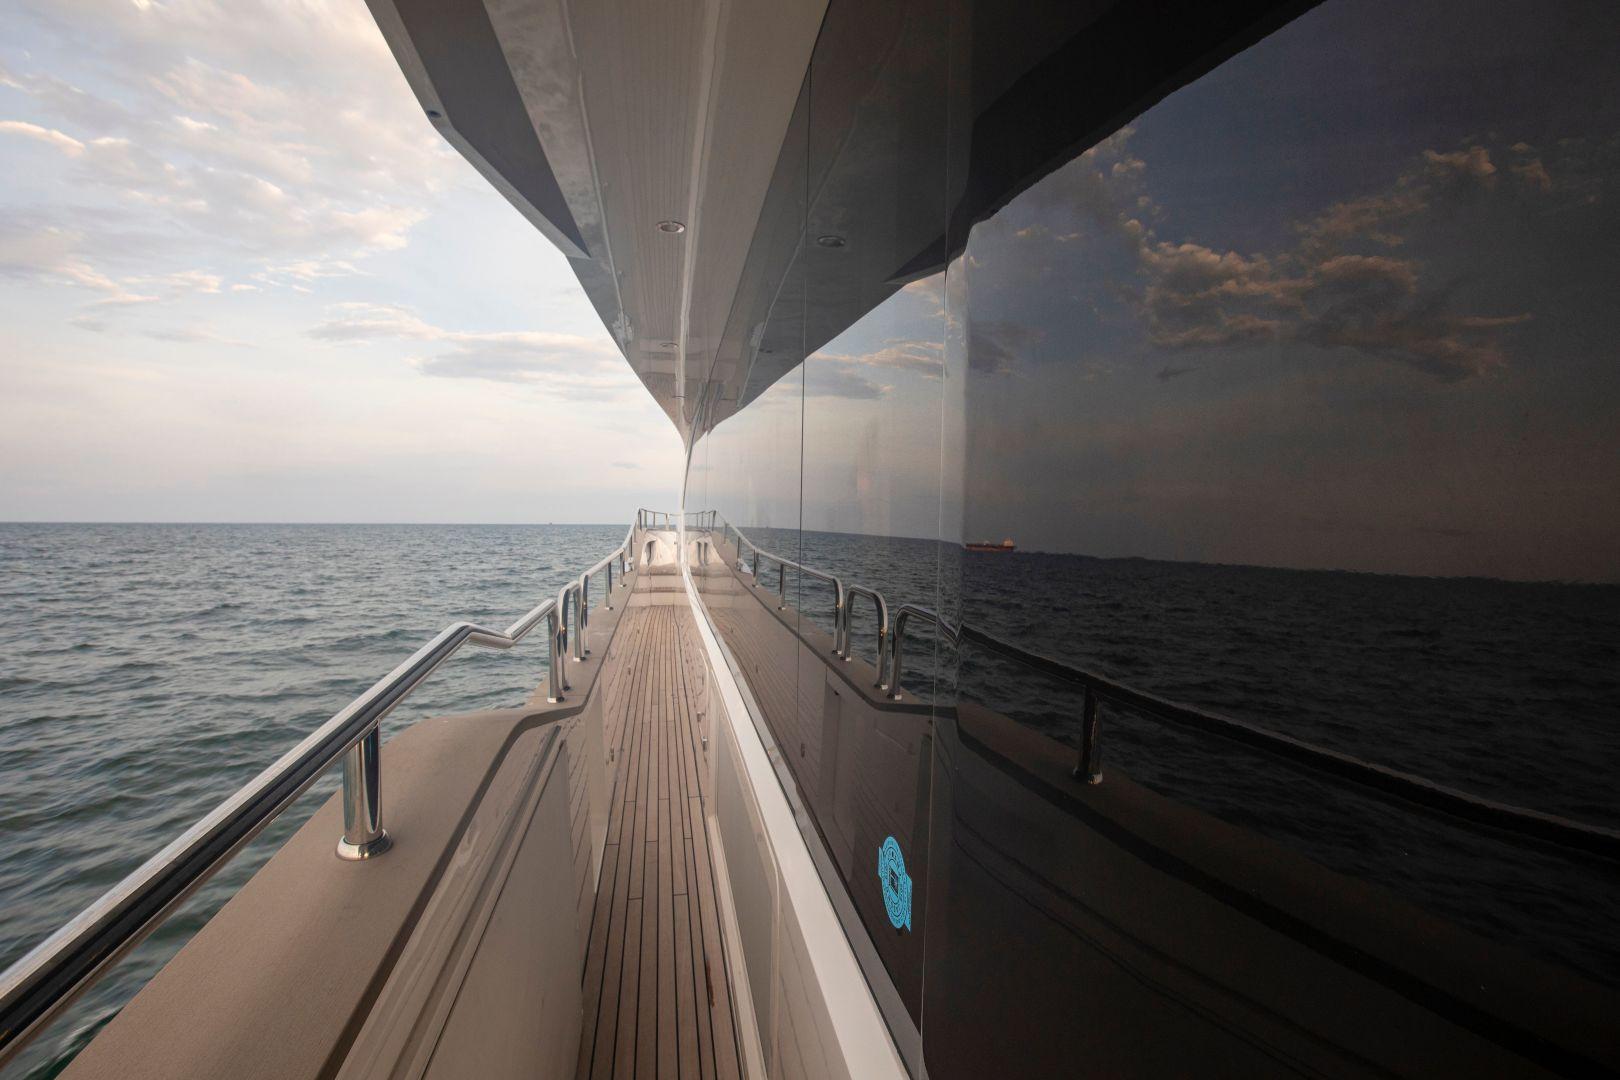 Sunseeker-95 Yacht 2017-Perseverance 3 Ft Lauderdale-Florida-United States-1400099   Thumbnail